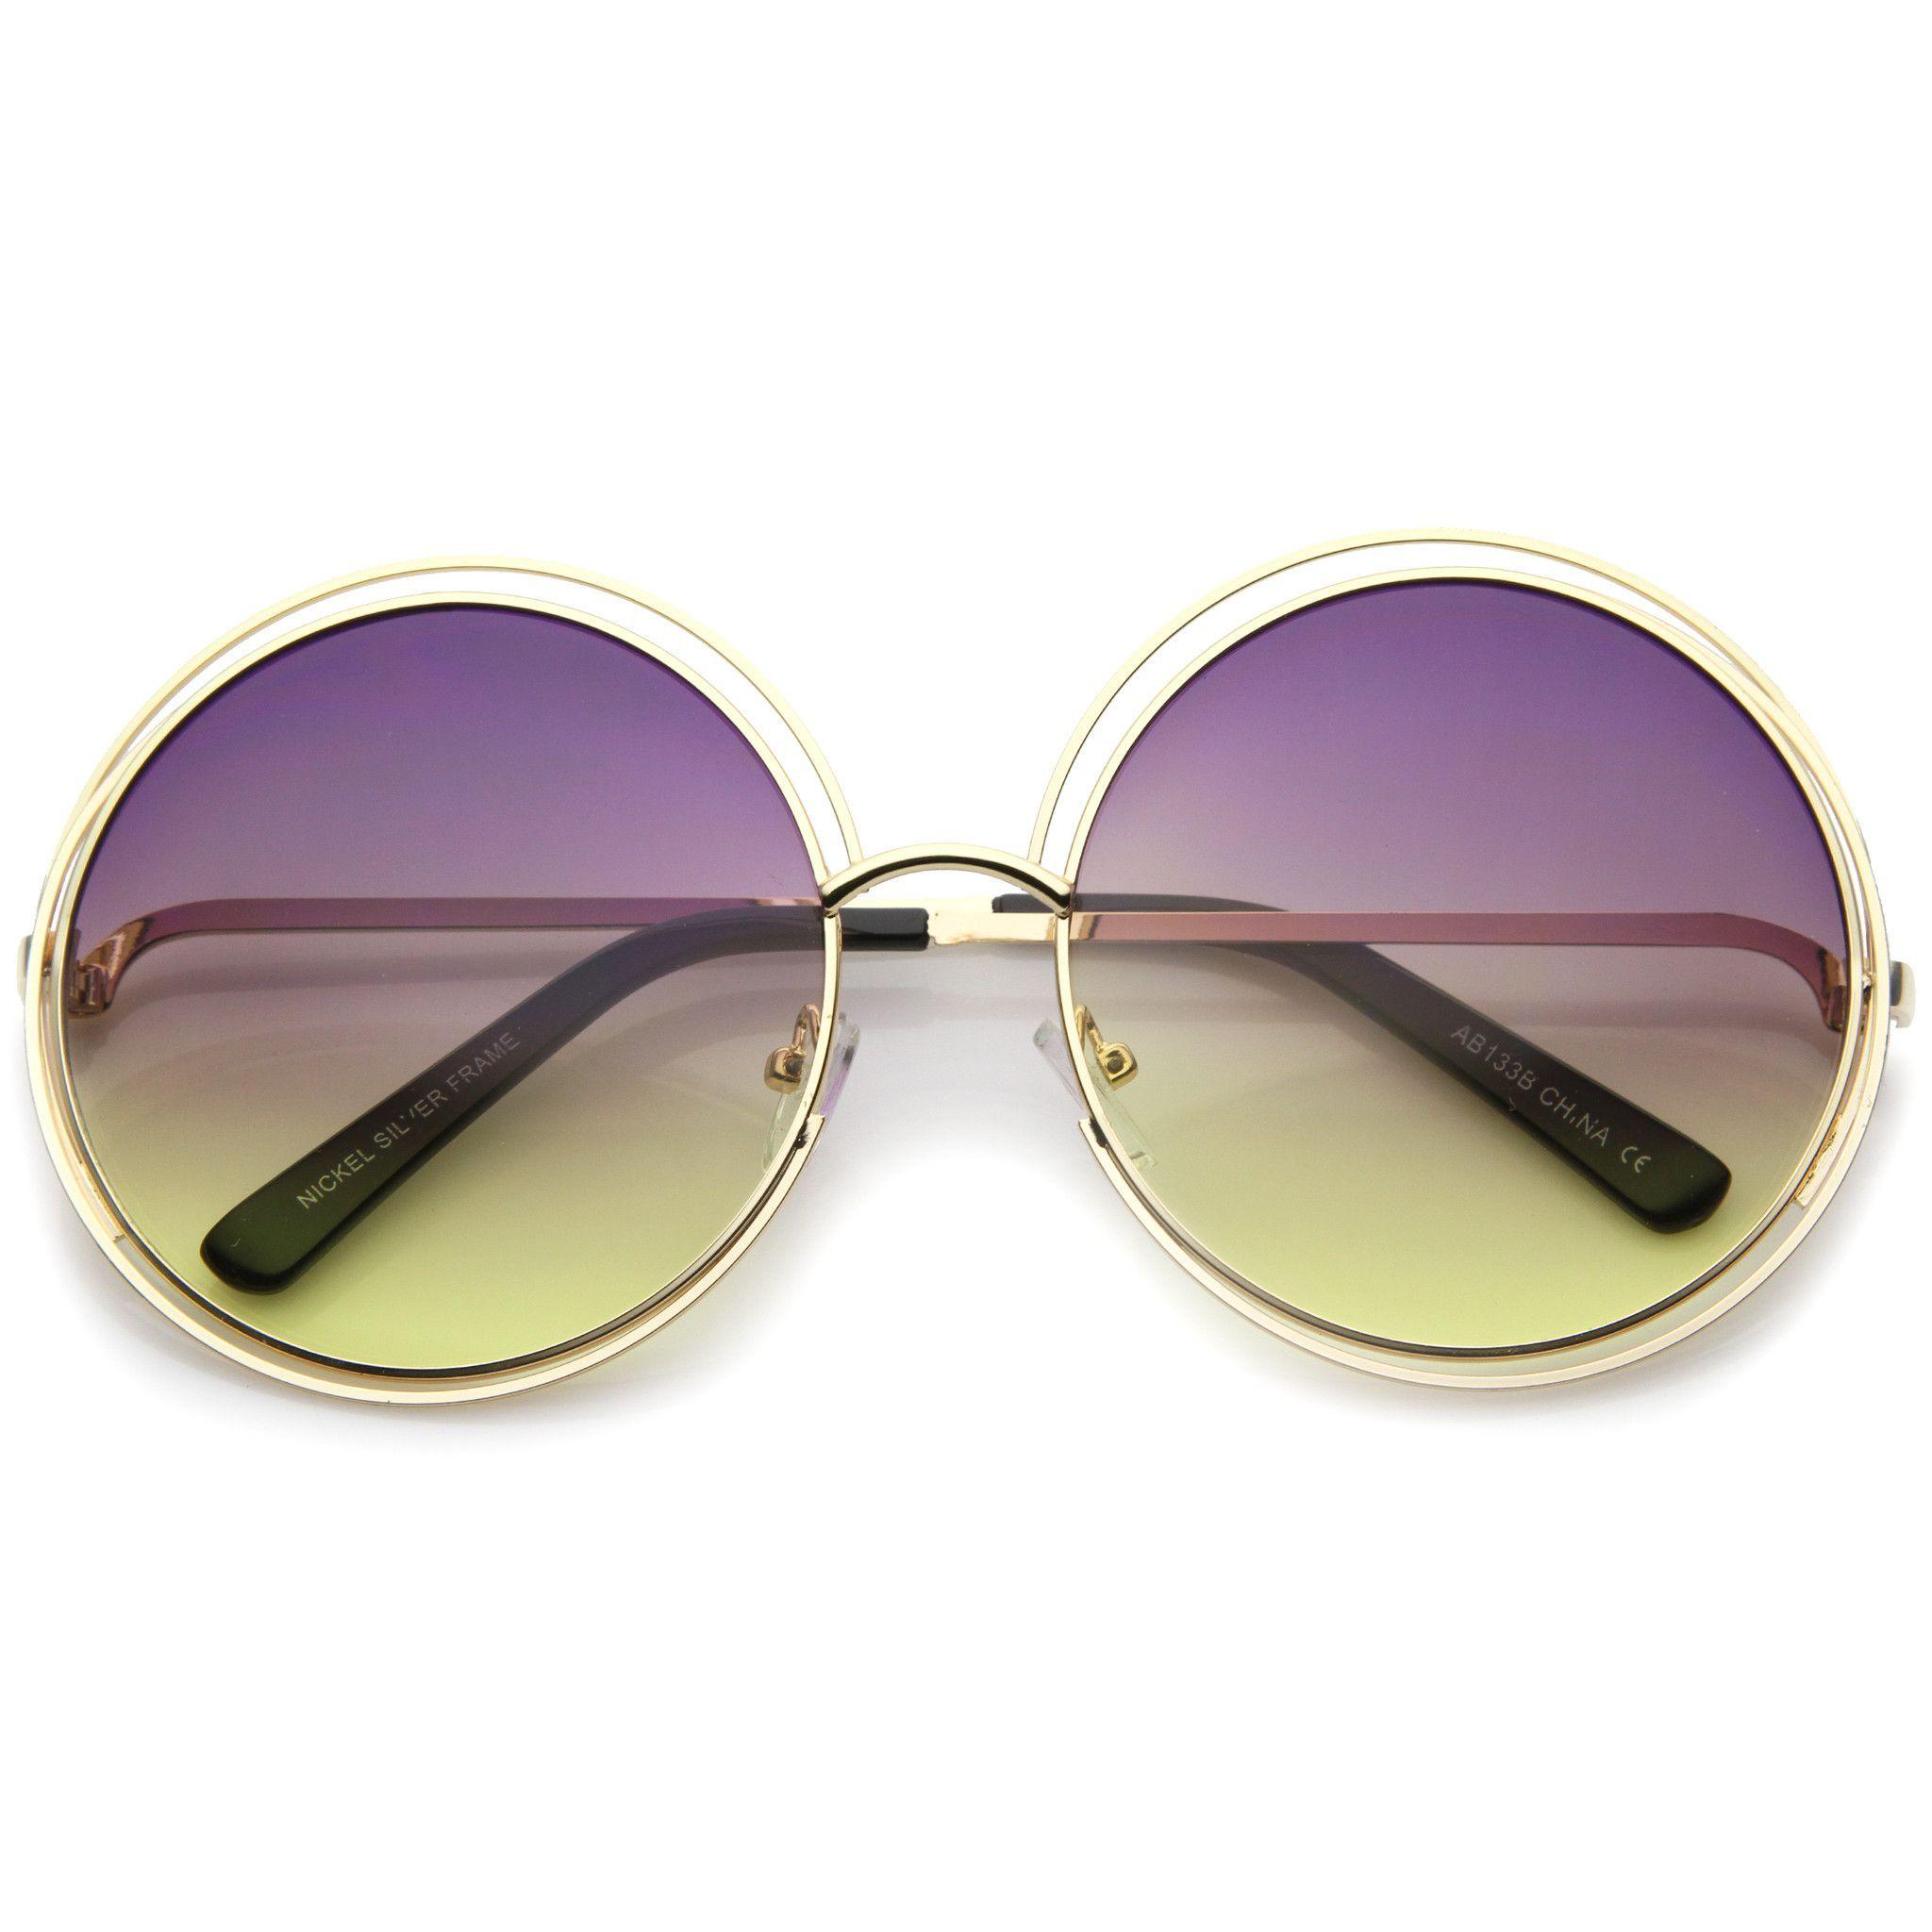 Women's Retro Hippie Oversize Round Gradient Lens Sunglasses A194